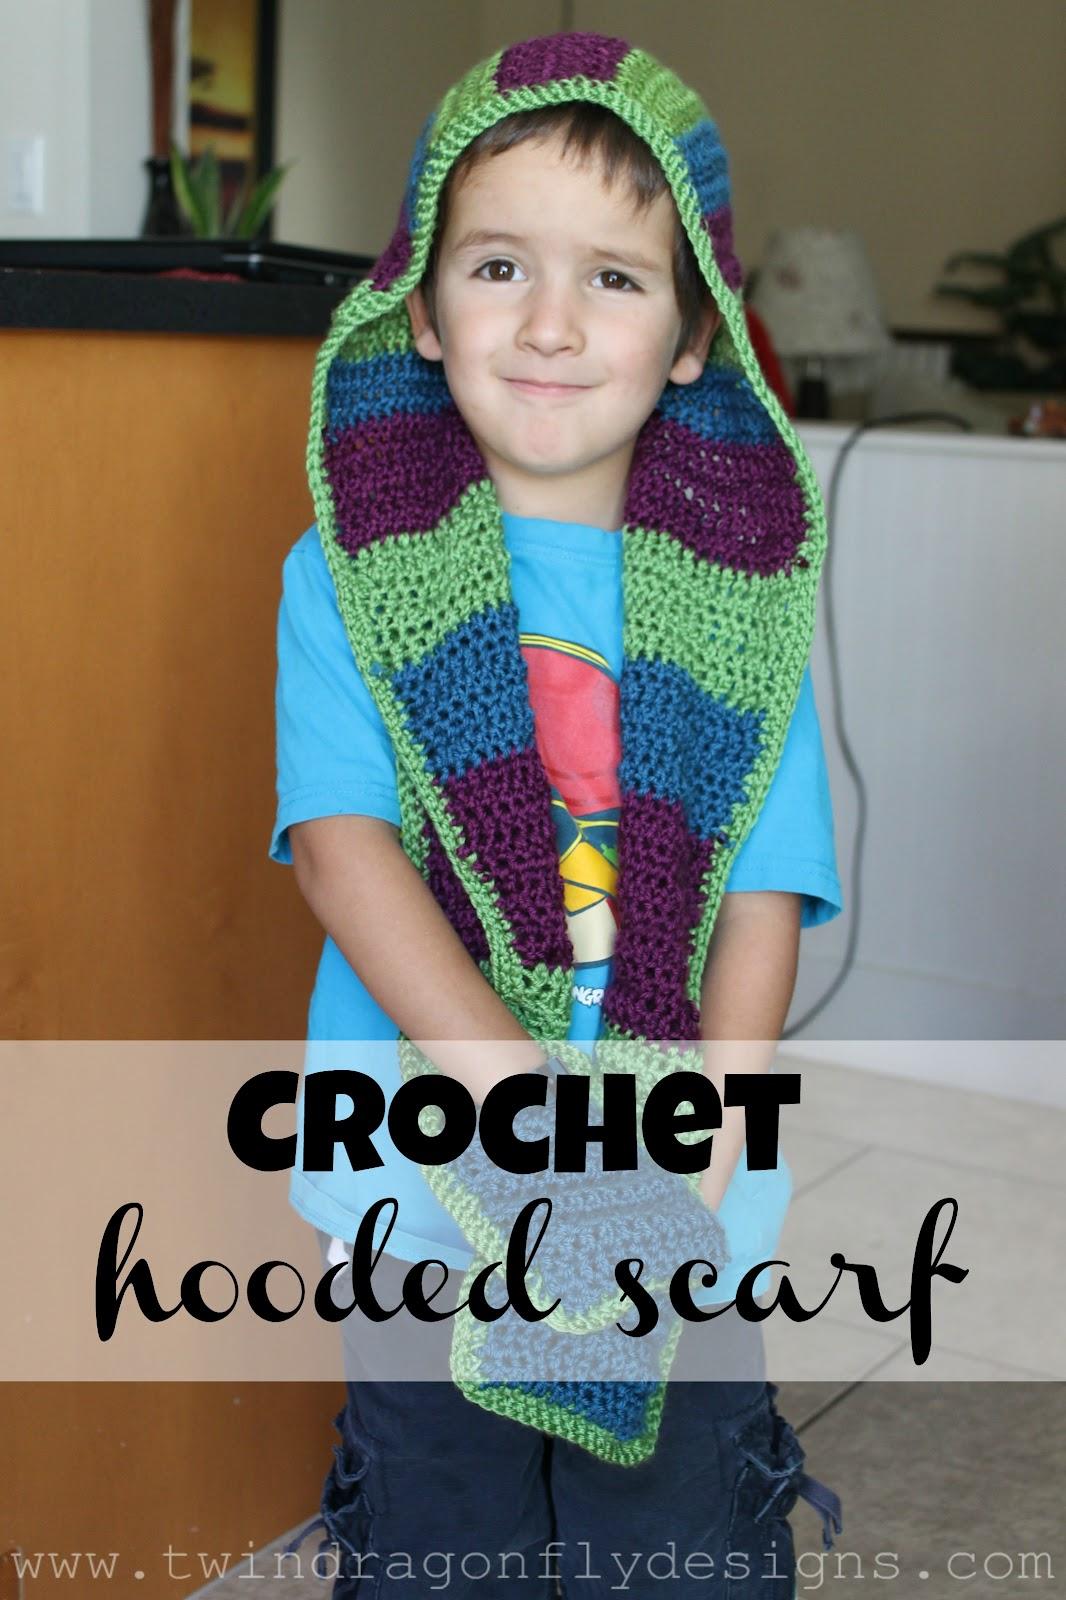 crochethoodedscarftitlejpg Crochet Childrens Scarf Crochet Childrens Scarf